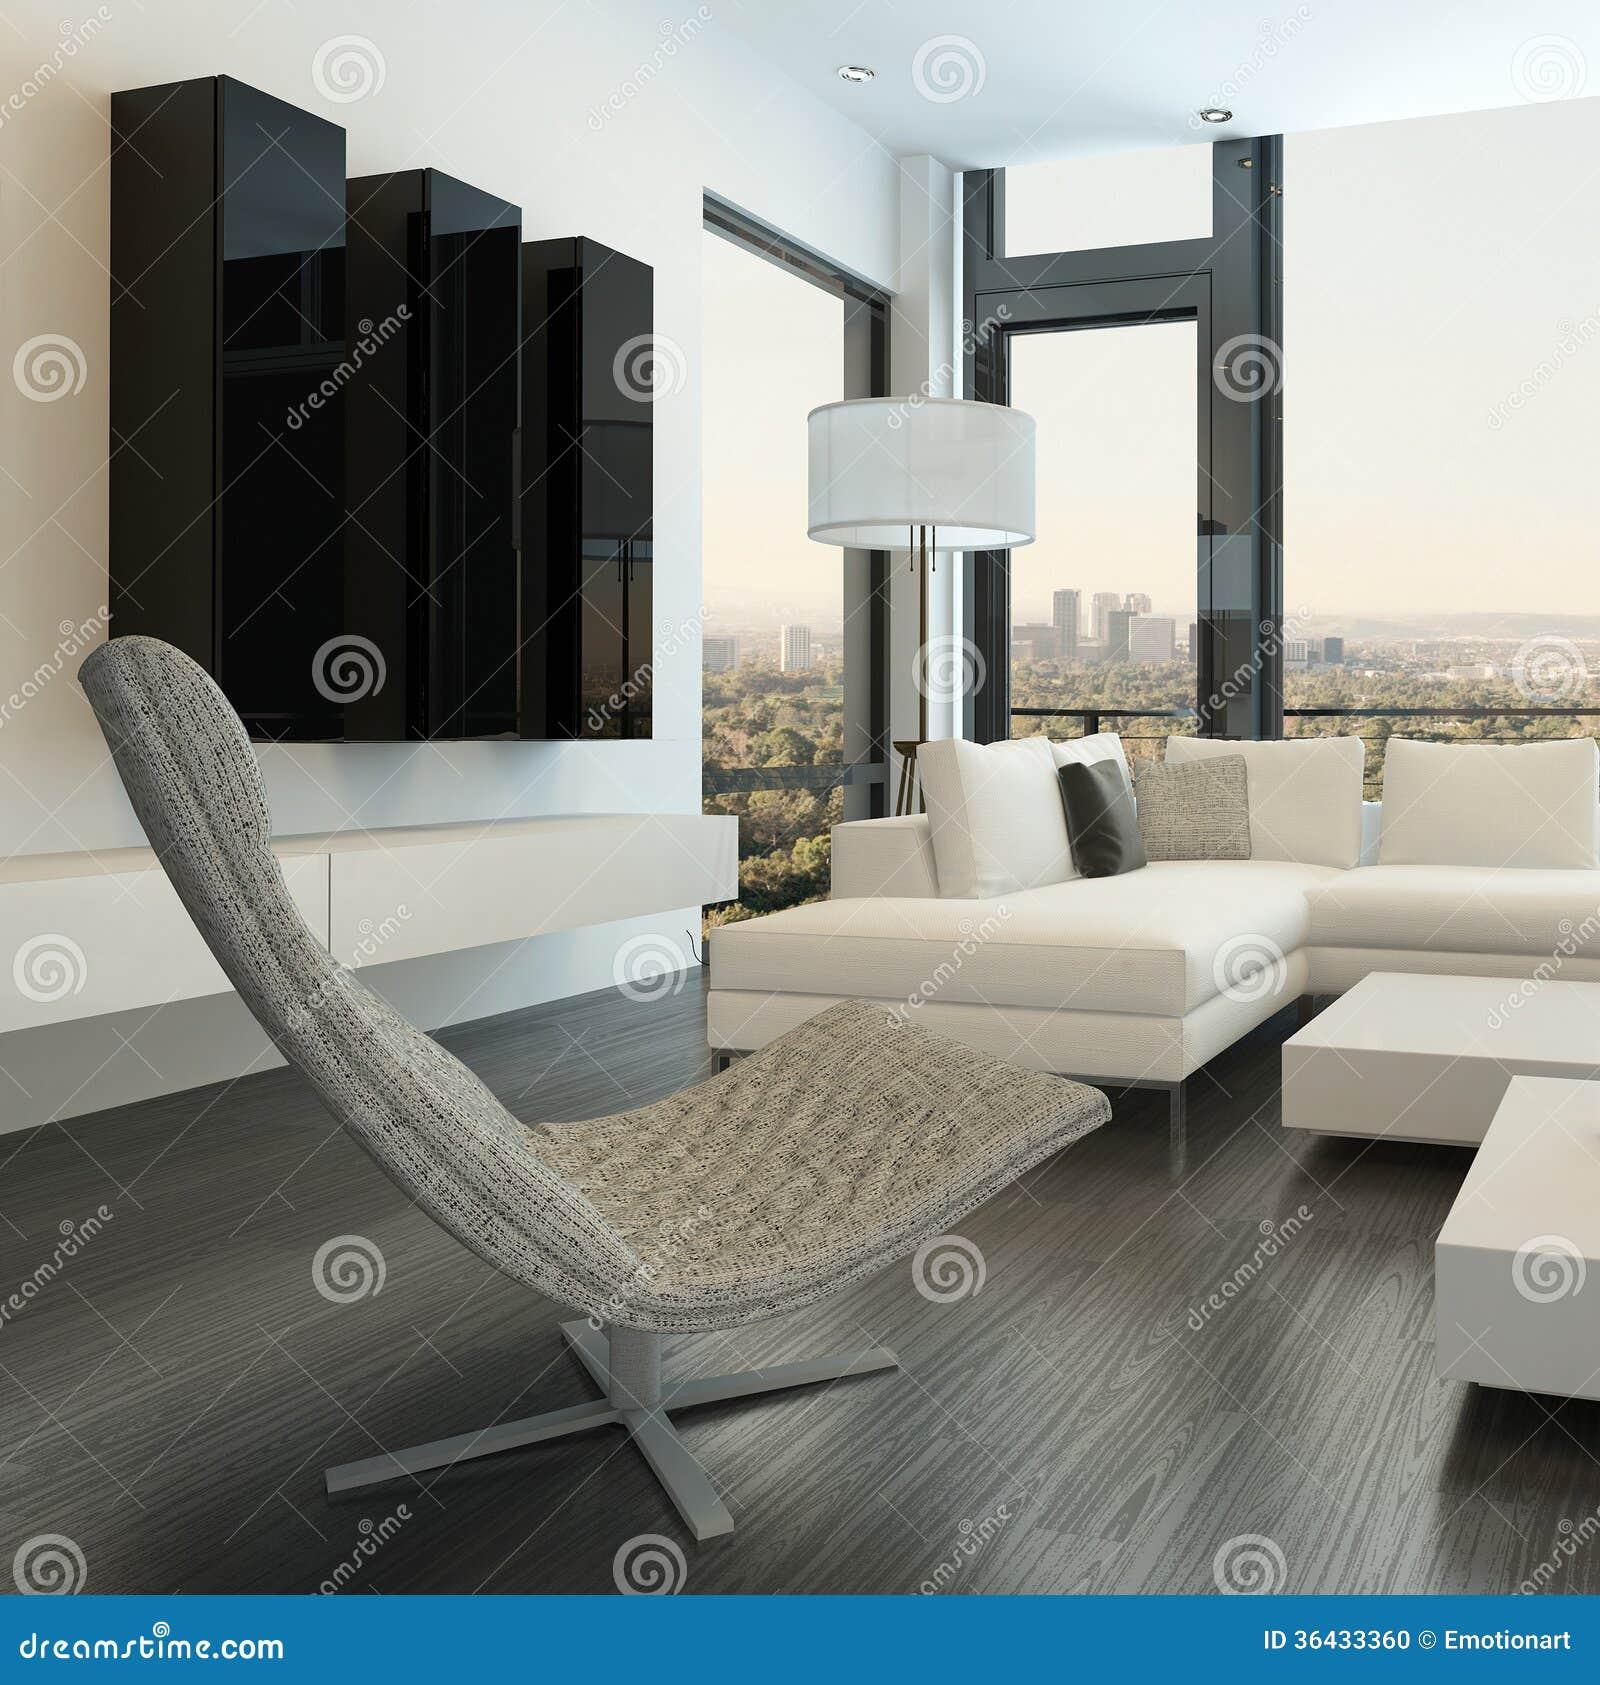 Imagenes de muebles modernos perfect muebles modernos for Muebles modernos